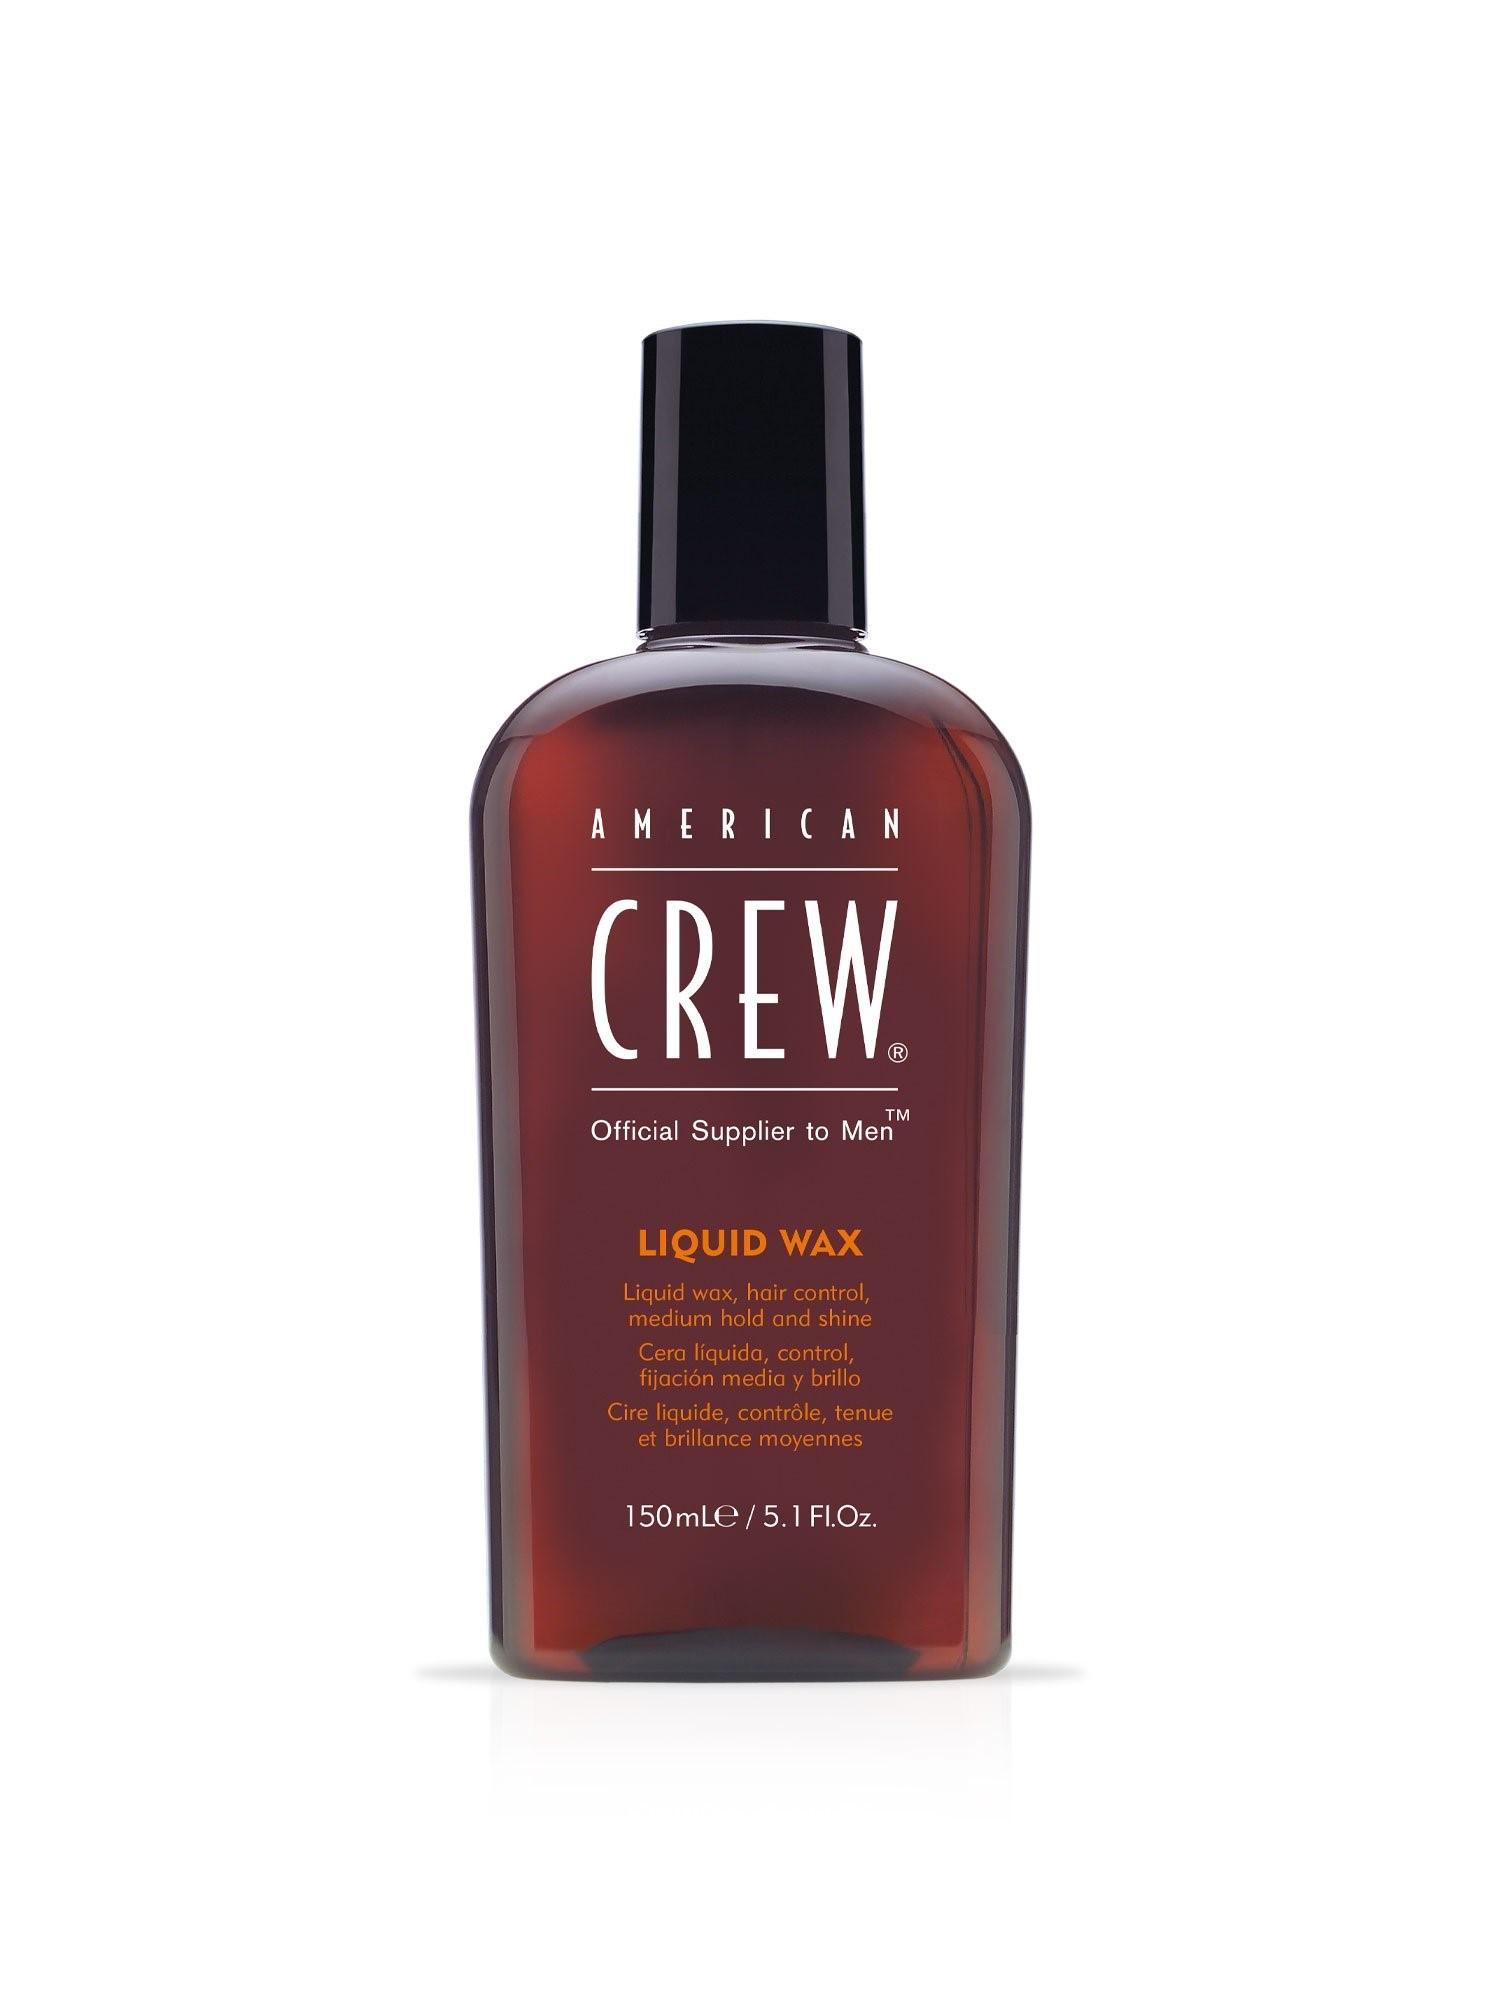 American Crew Liquid Wax 5.1oz